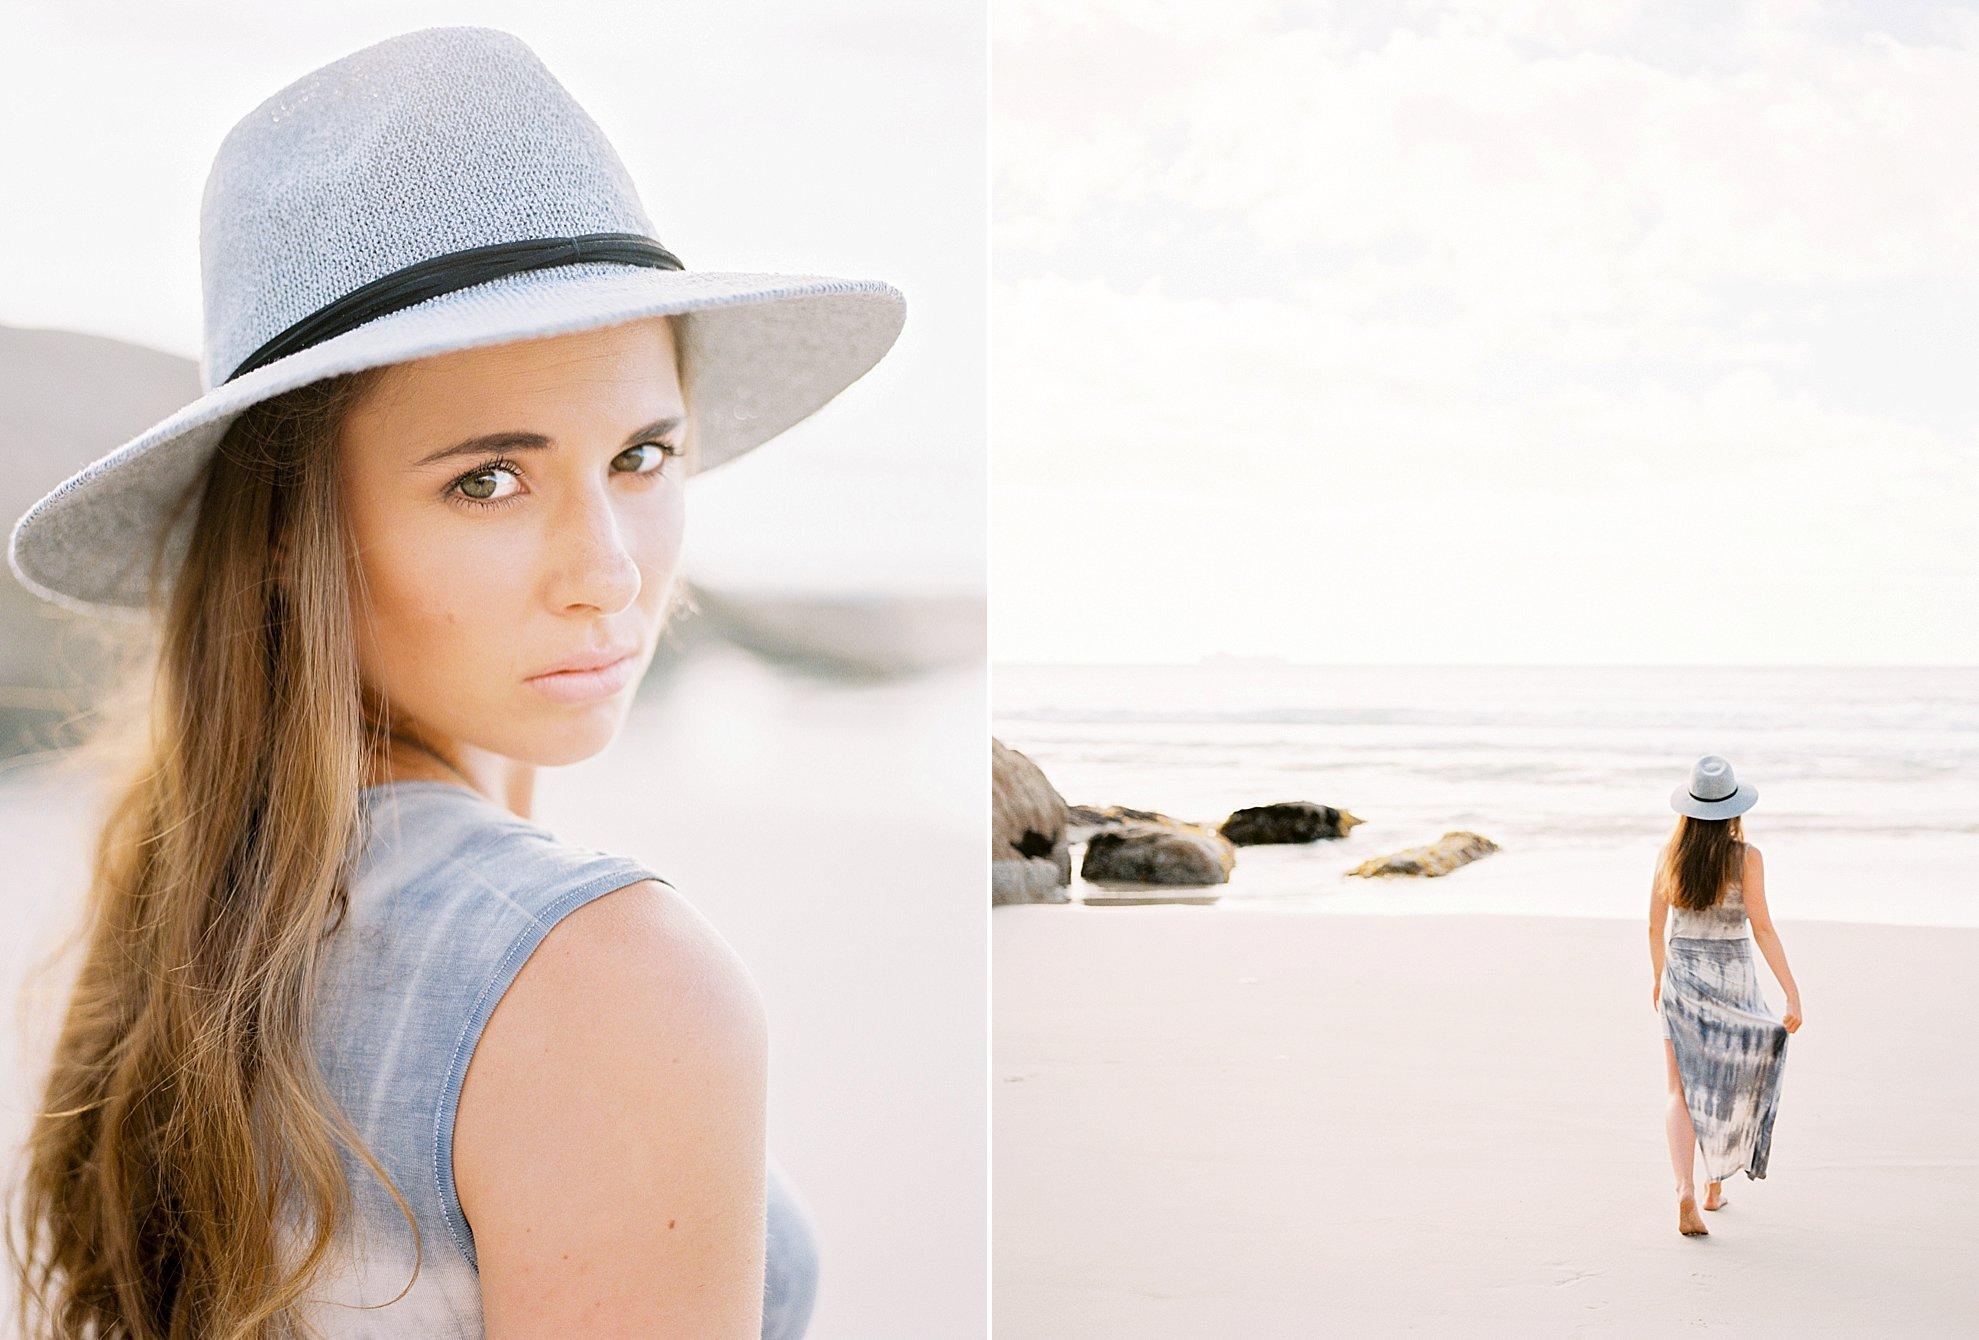 Amanda-Drost-photography-editorial-South-Africa-fashion-fotografie-mode-Zuid-Afrika_0017.jpg